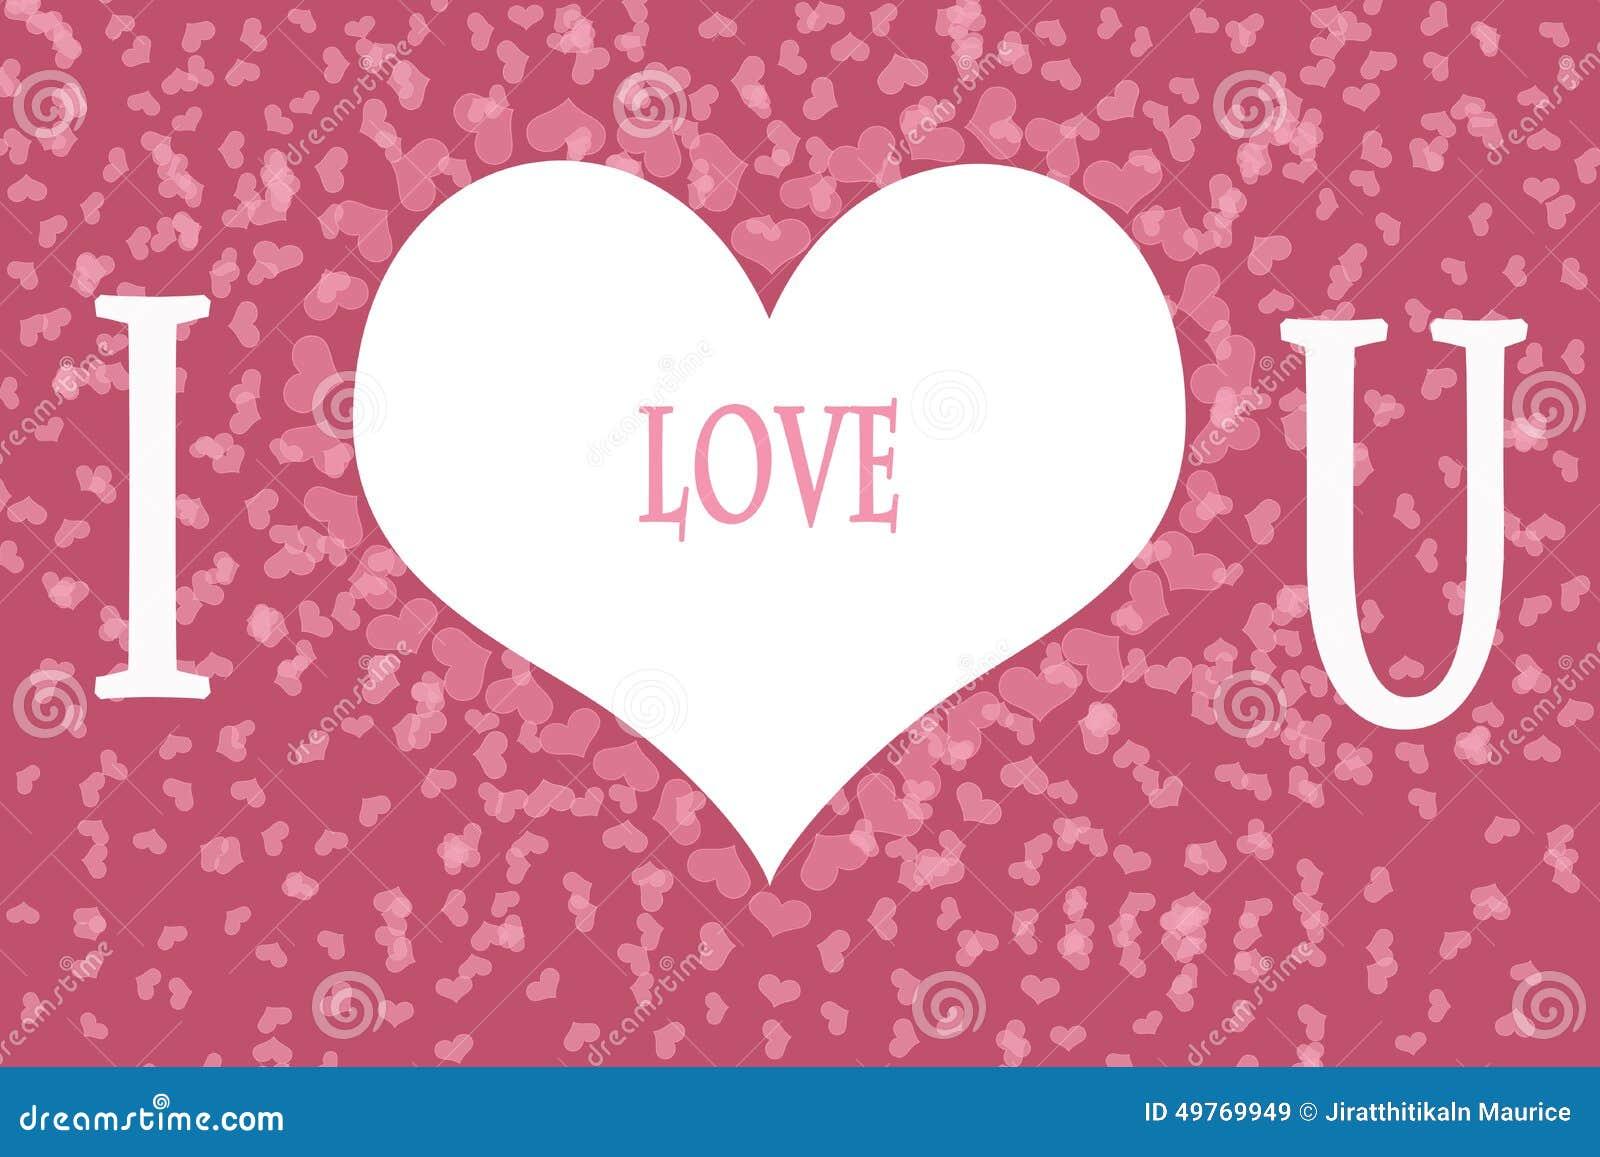 I Love You Imágenes De Stock I Love You Fotos De Stock: I Love You On Pink Heart Pattern Background Stock